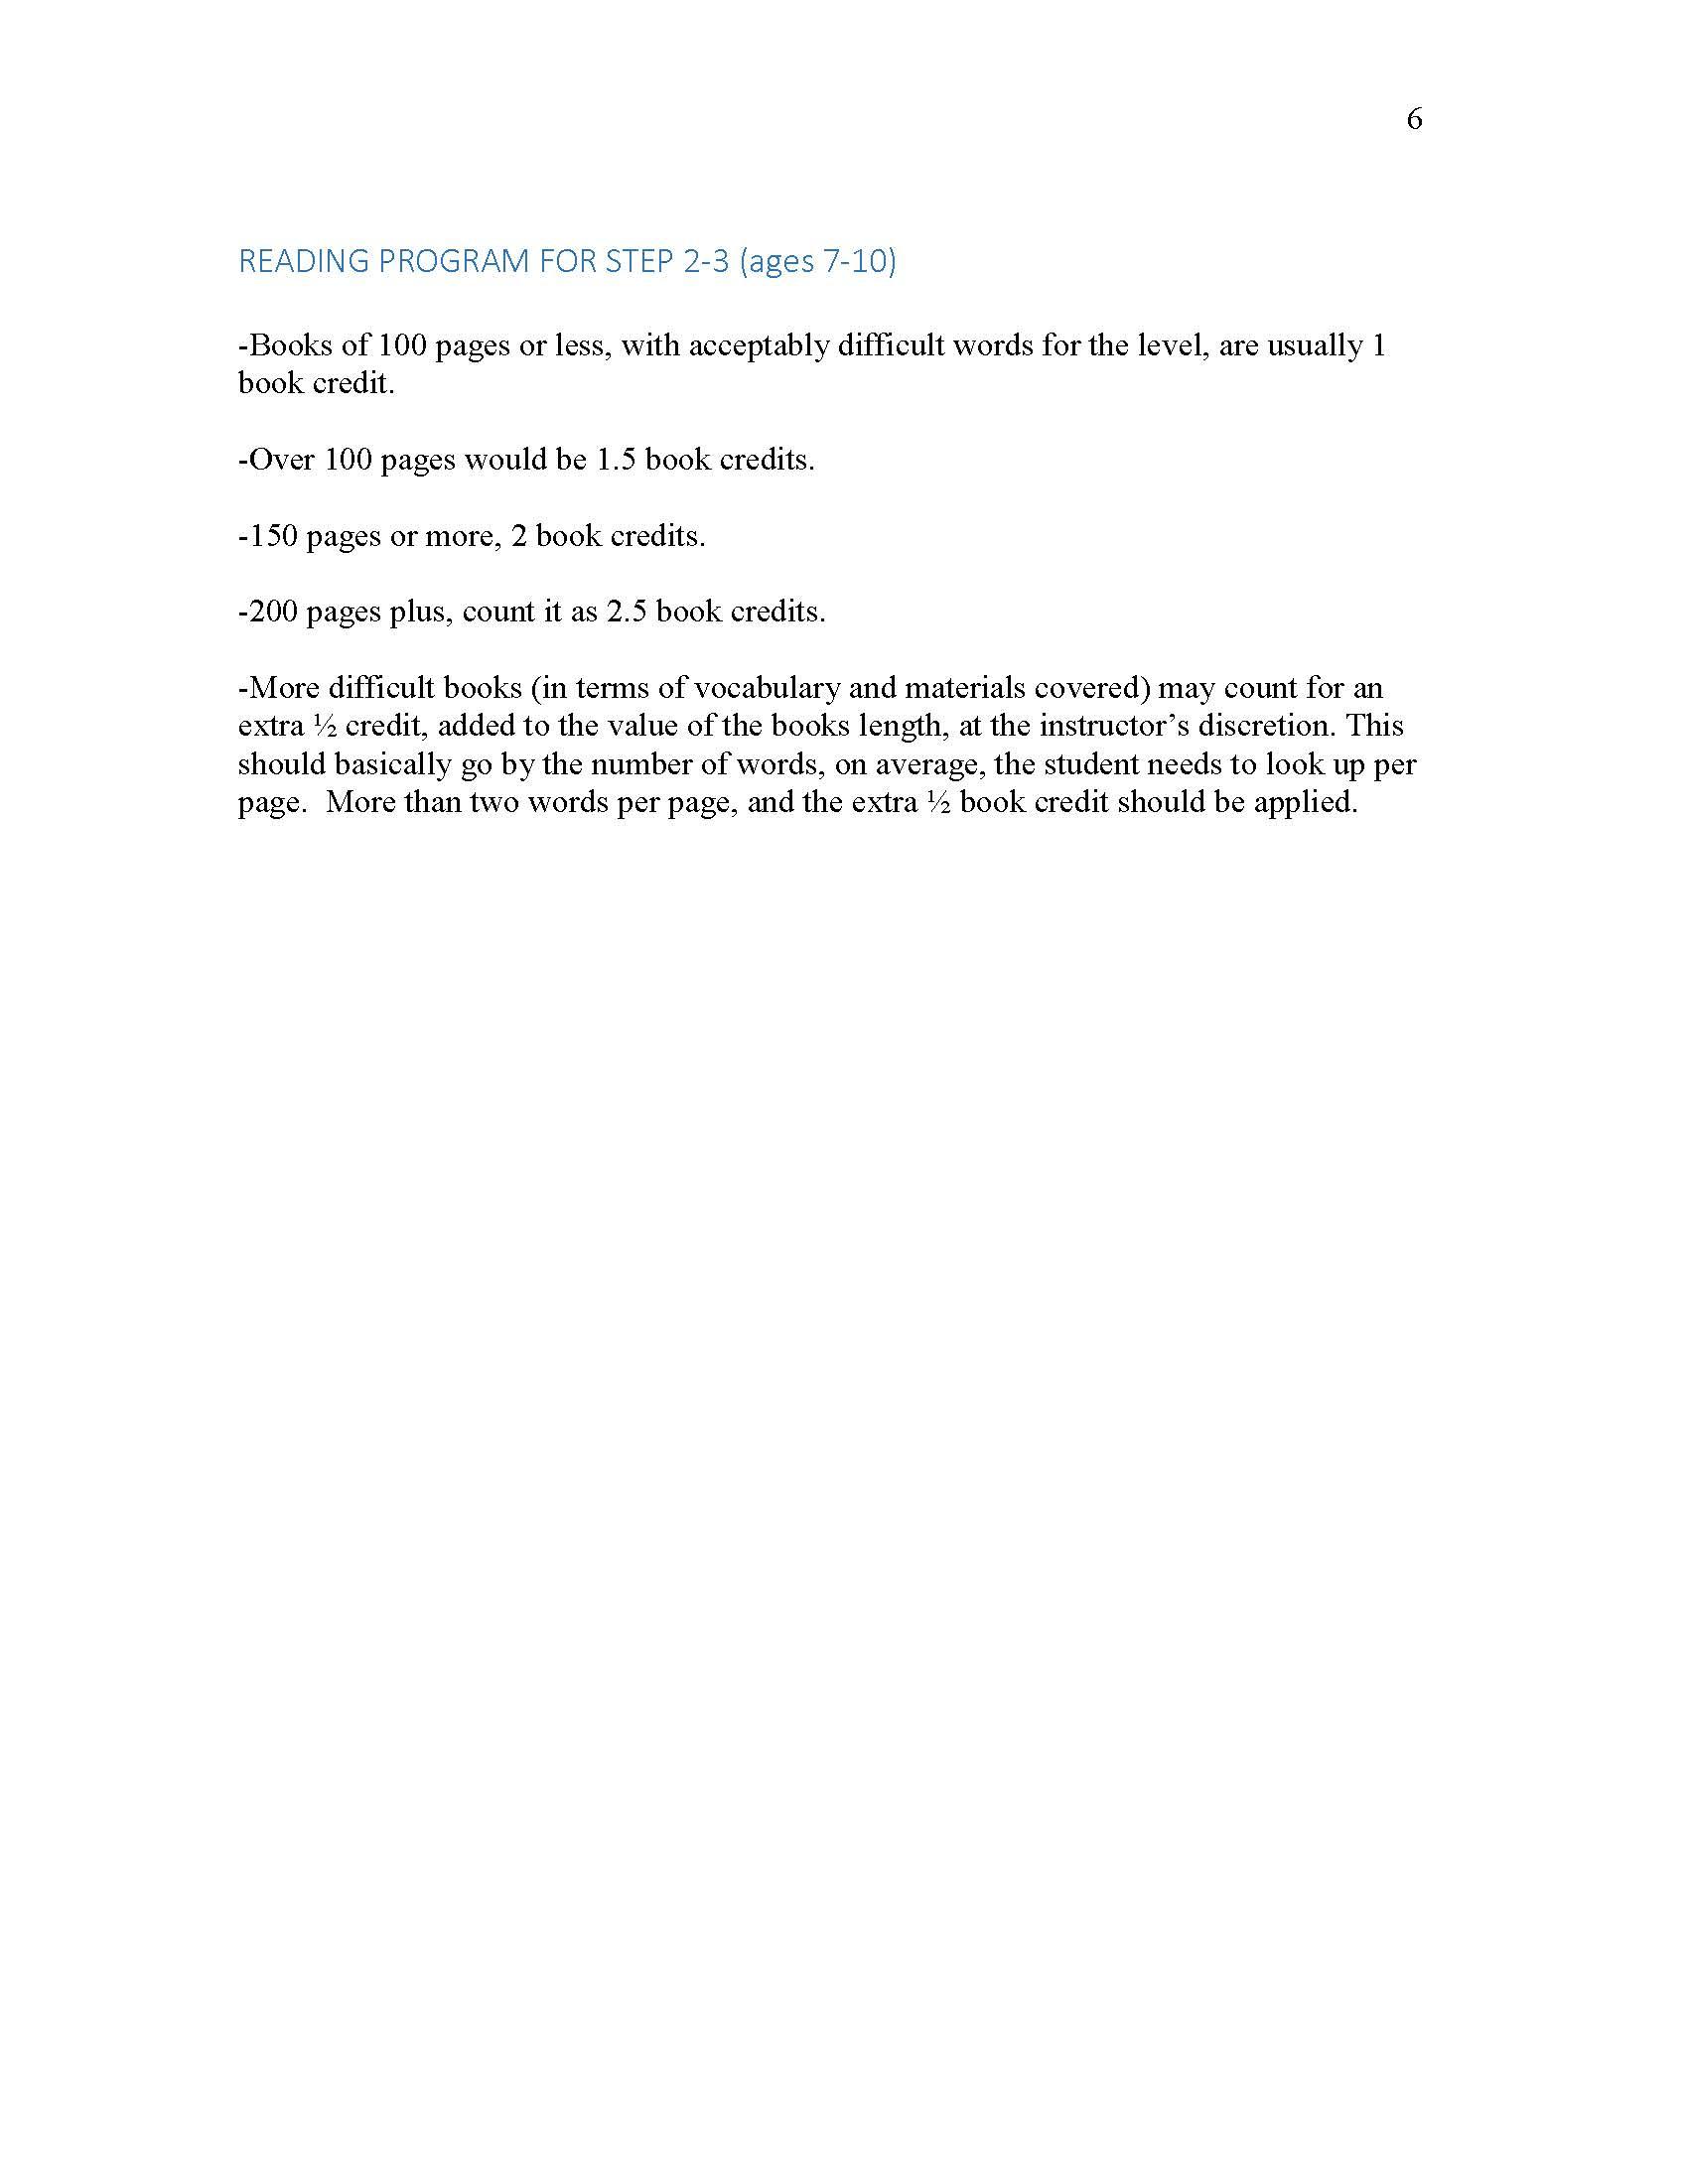 Samples STEP 3-4 Basic Reading Program_Page_07.jpg